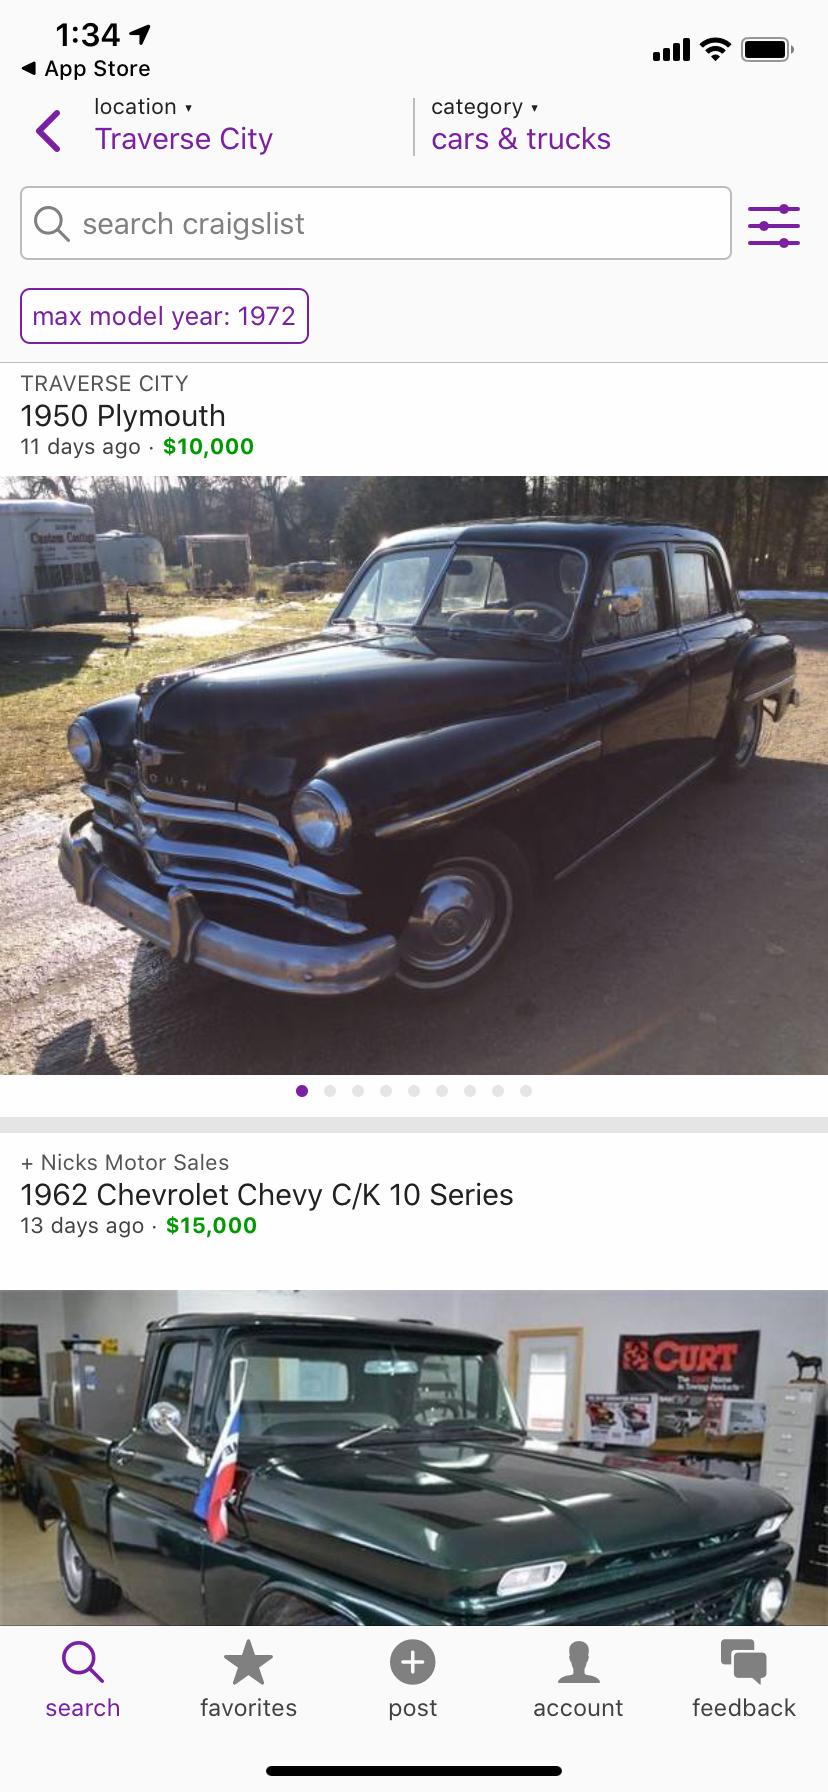 Craigslist cars trucks local listings page